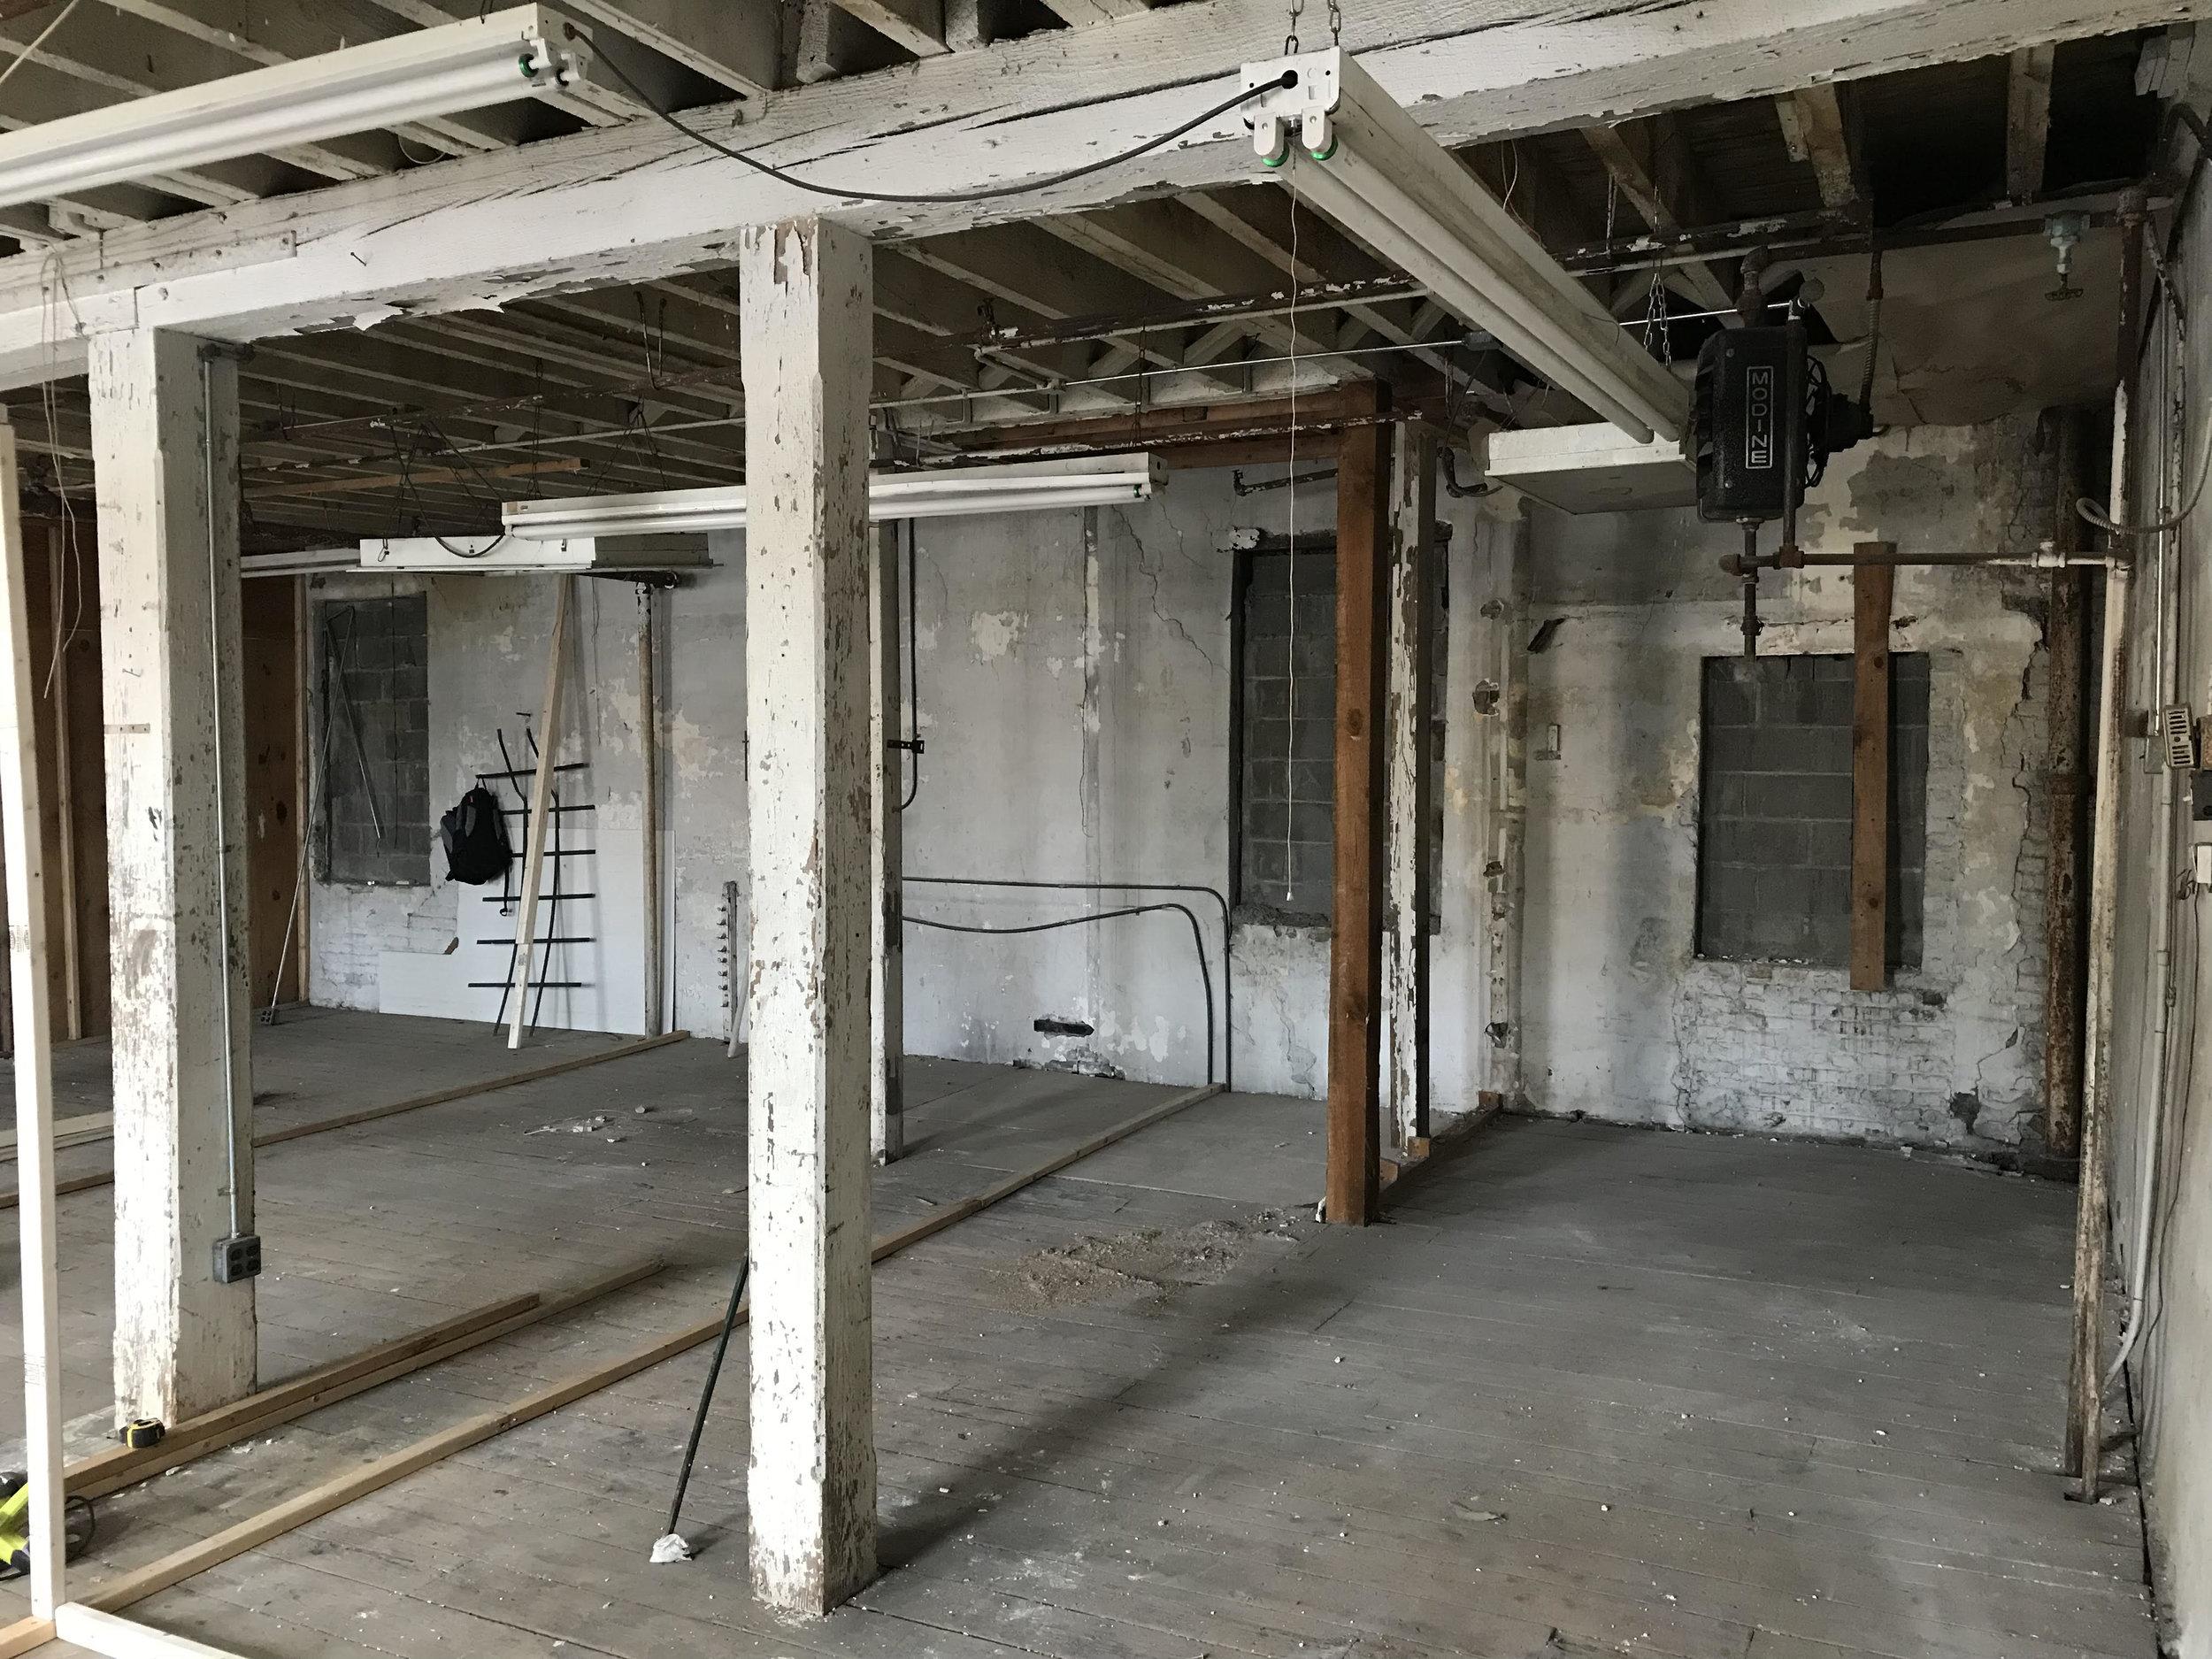 120 Waterbury Street, Brooklyn east wall (posted 27 March 2018, pre-renovation)